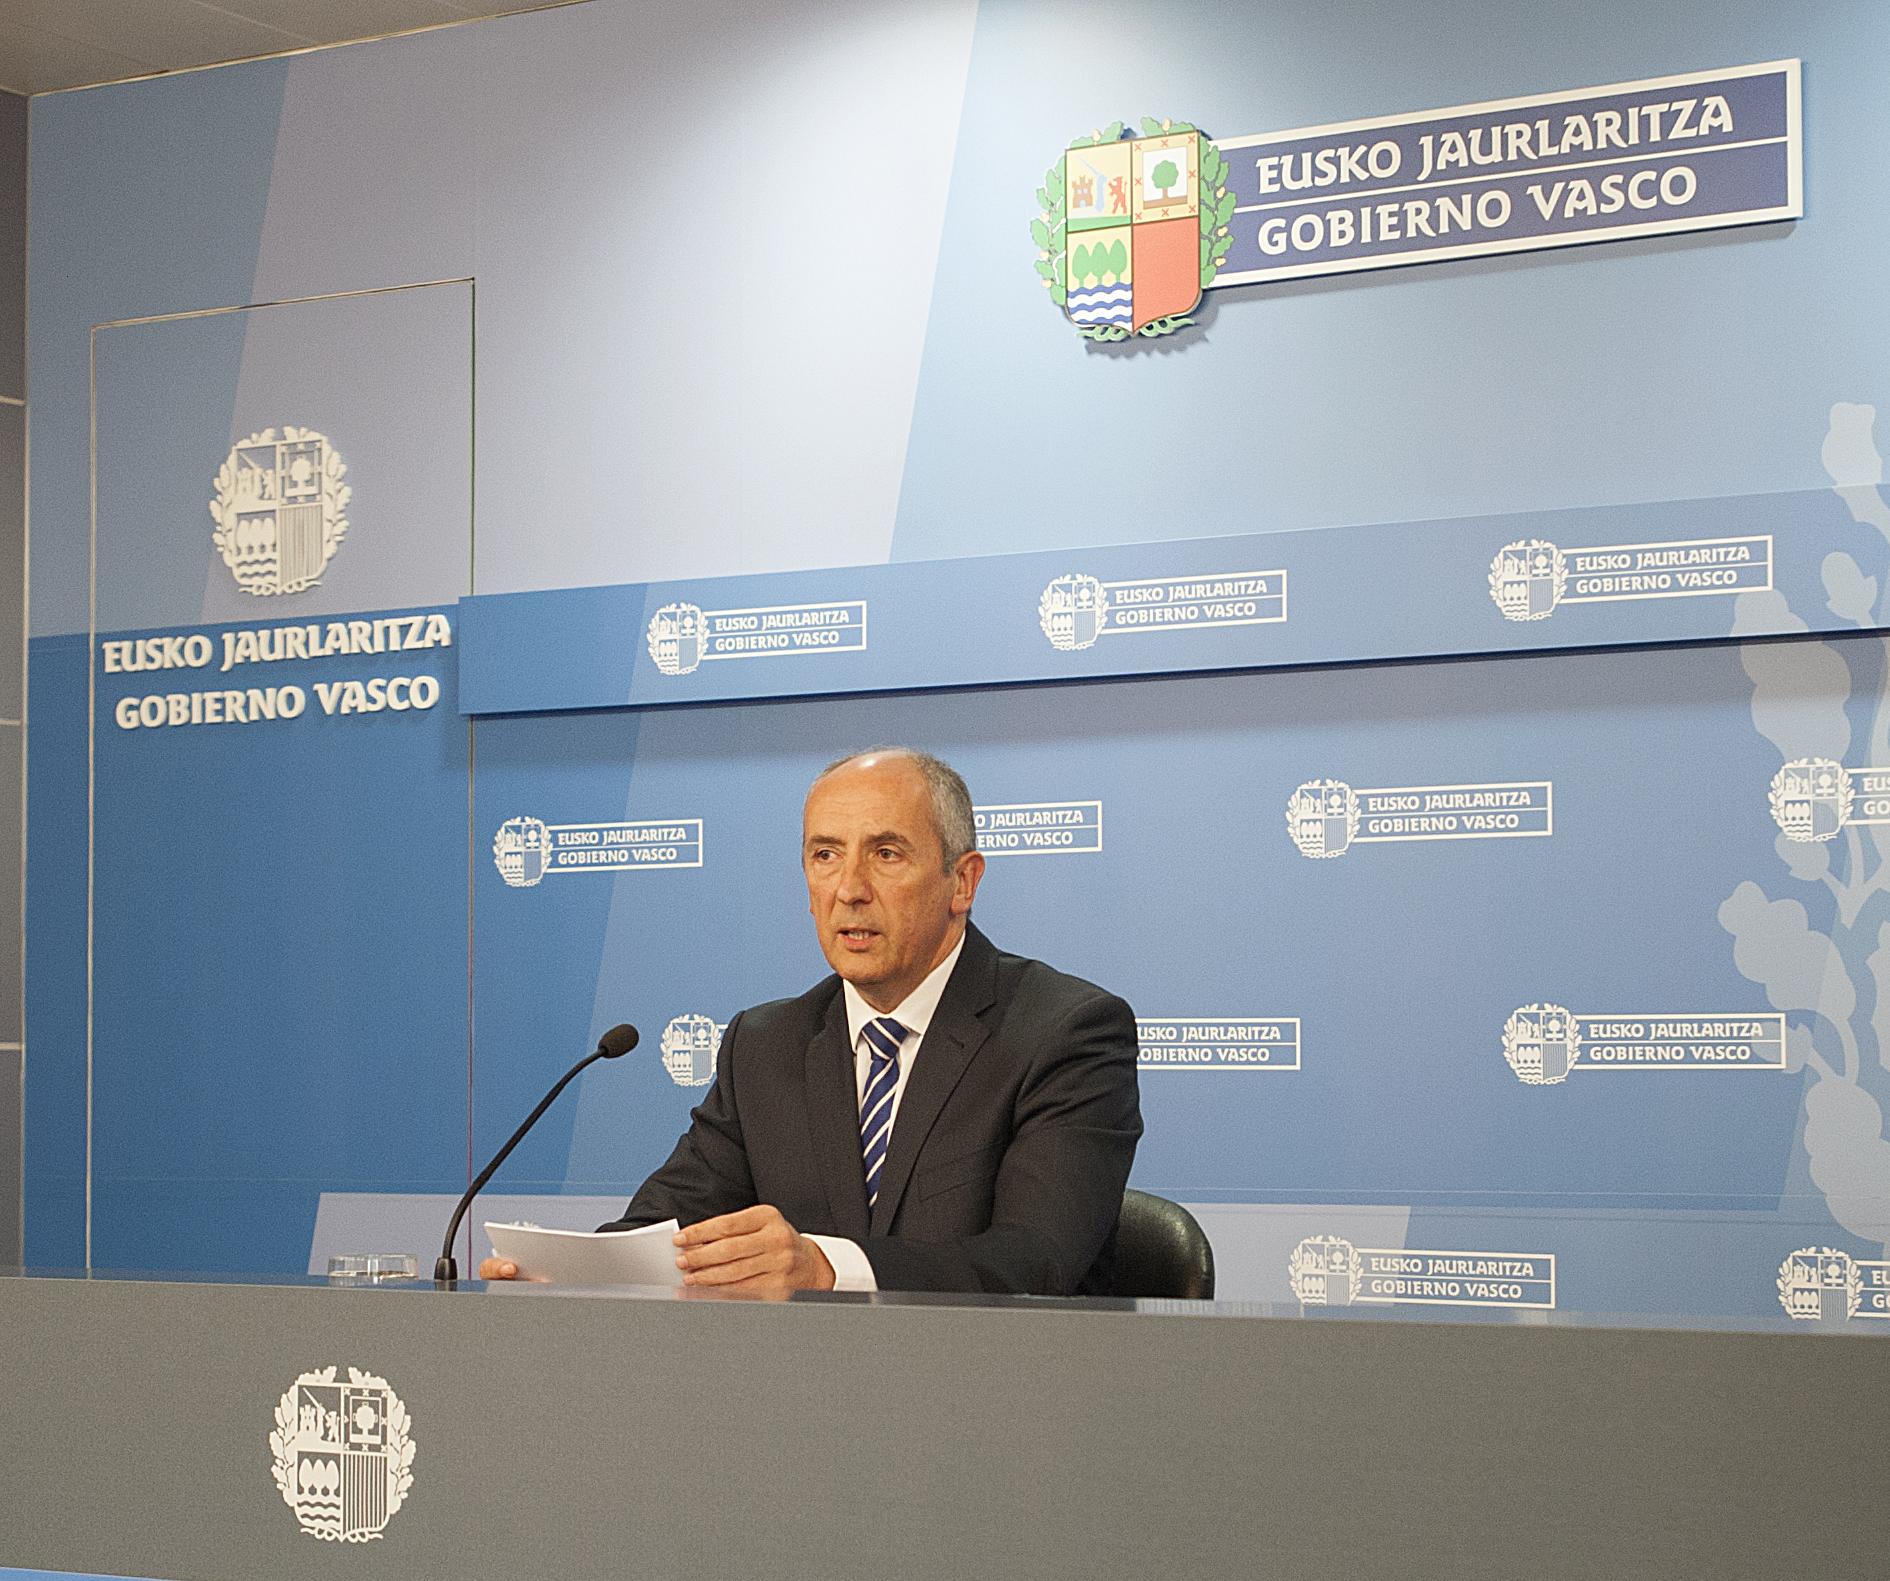 20150714_consejo_gobierno4.jpg